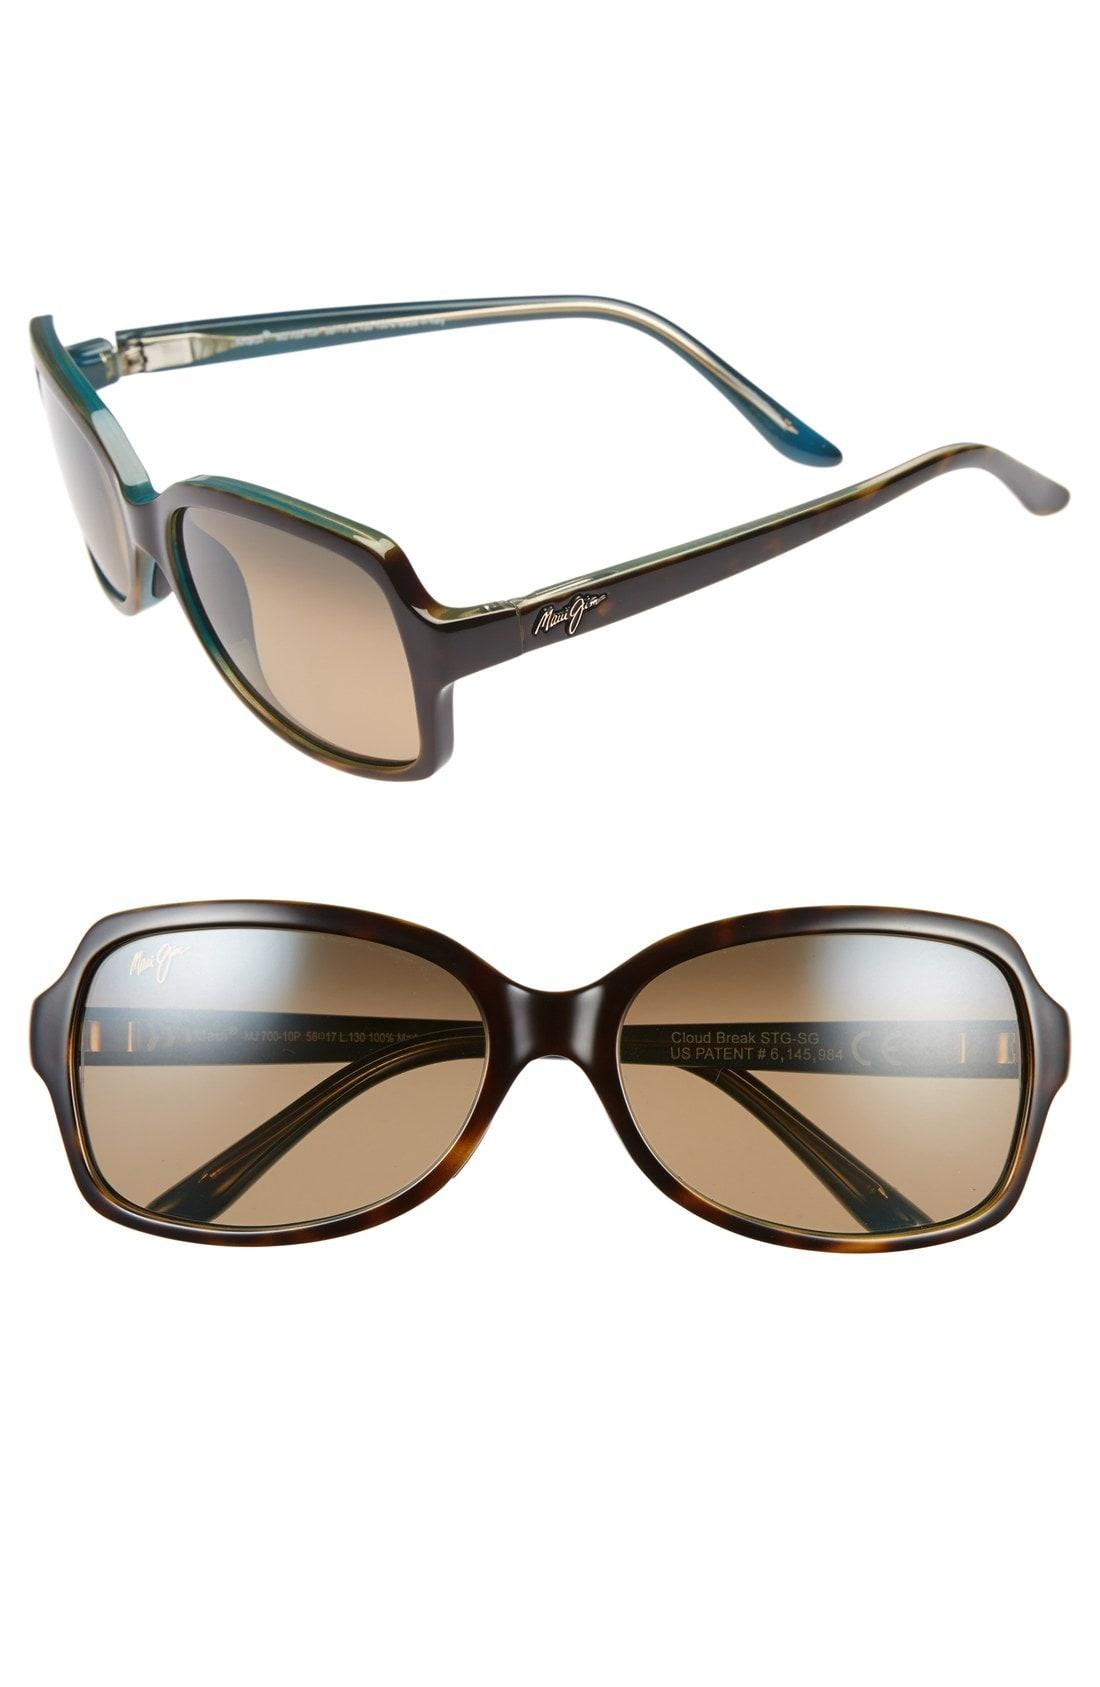 9732759e1b Maui Jim Cloud Break 56Mm Polarizedplus2 Sunglasses - Tortoise Peacock/  Blue/ Bronze In Brown